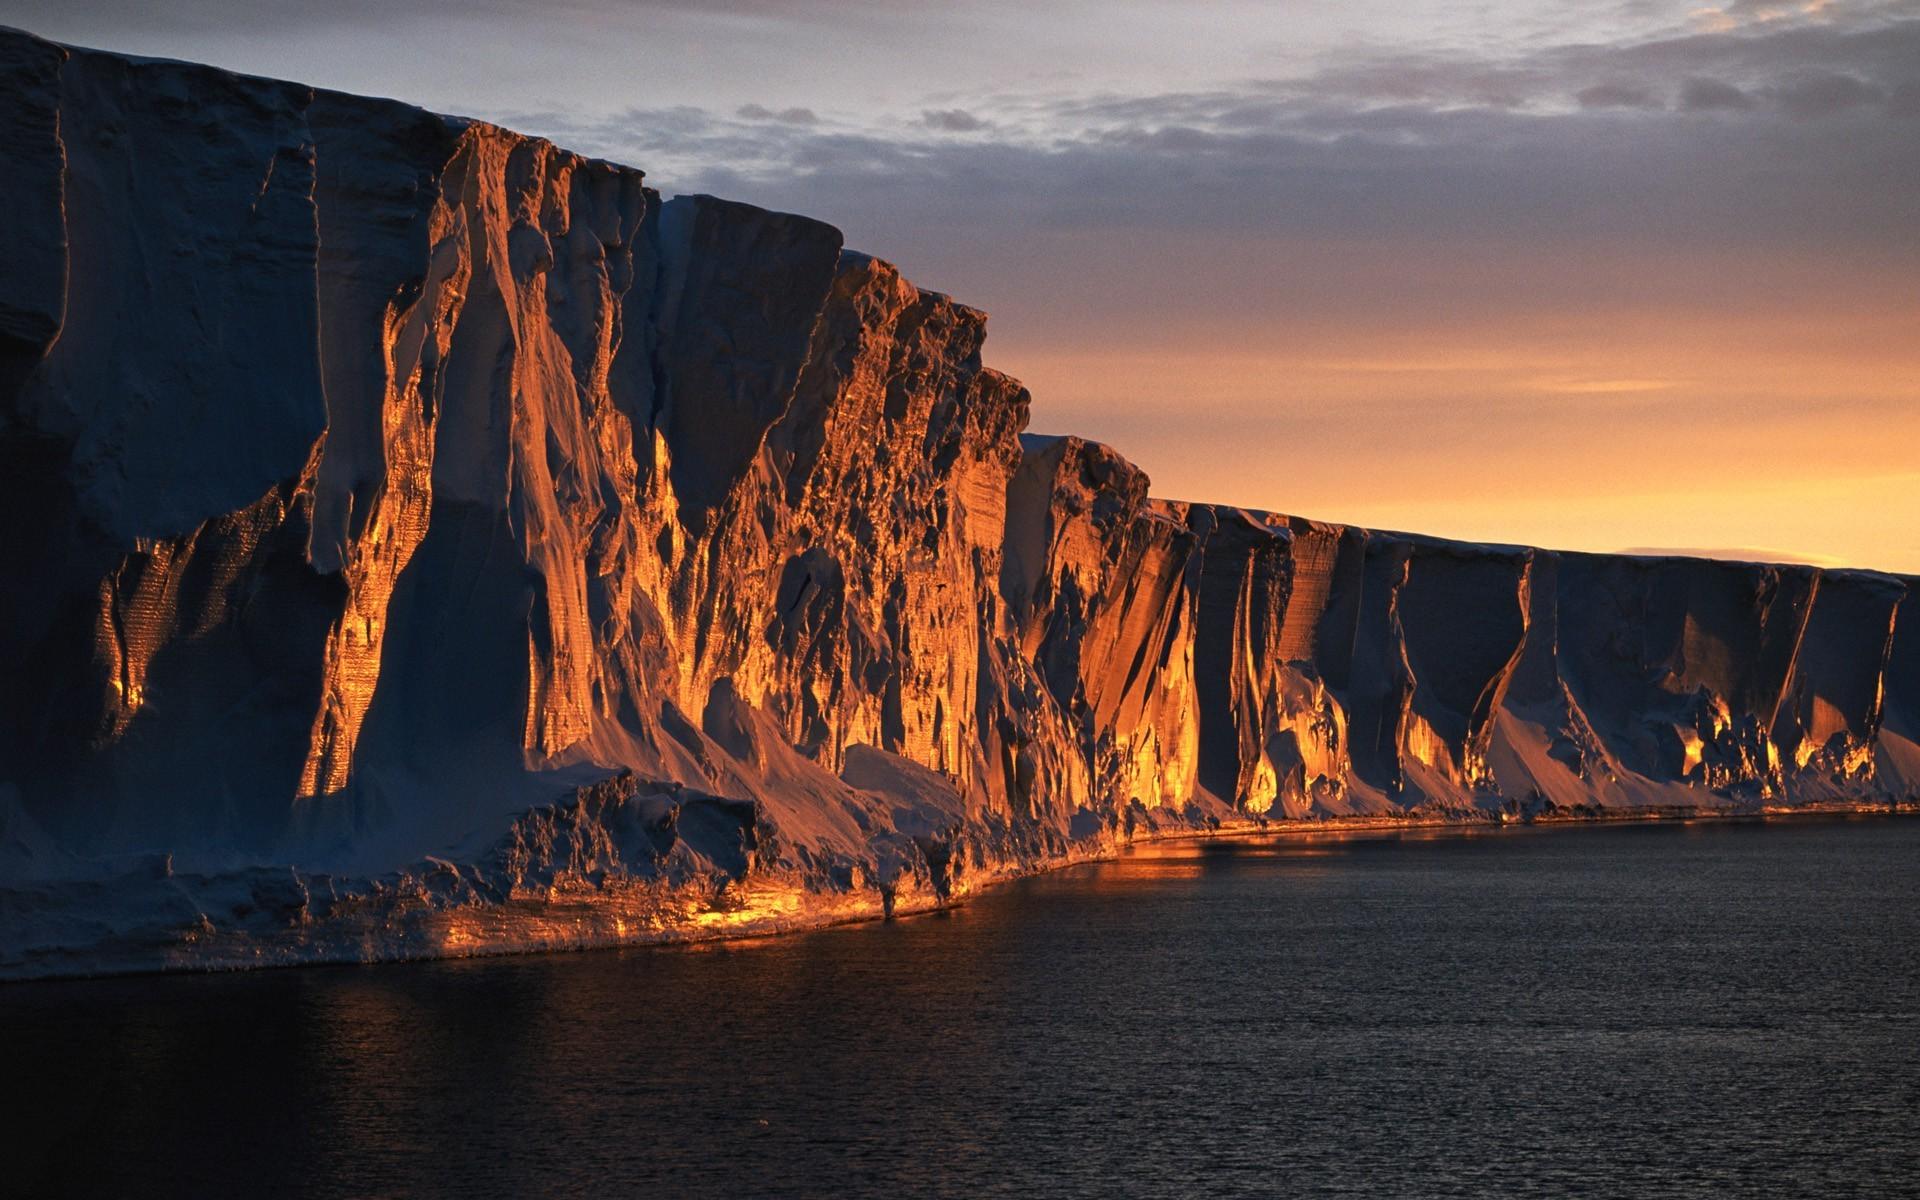 Good Evening Hd Wallpaper Wallpaper Landscape Sunset Sea Bay Night Rock